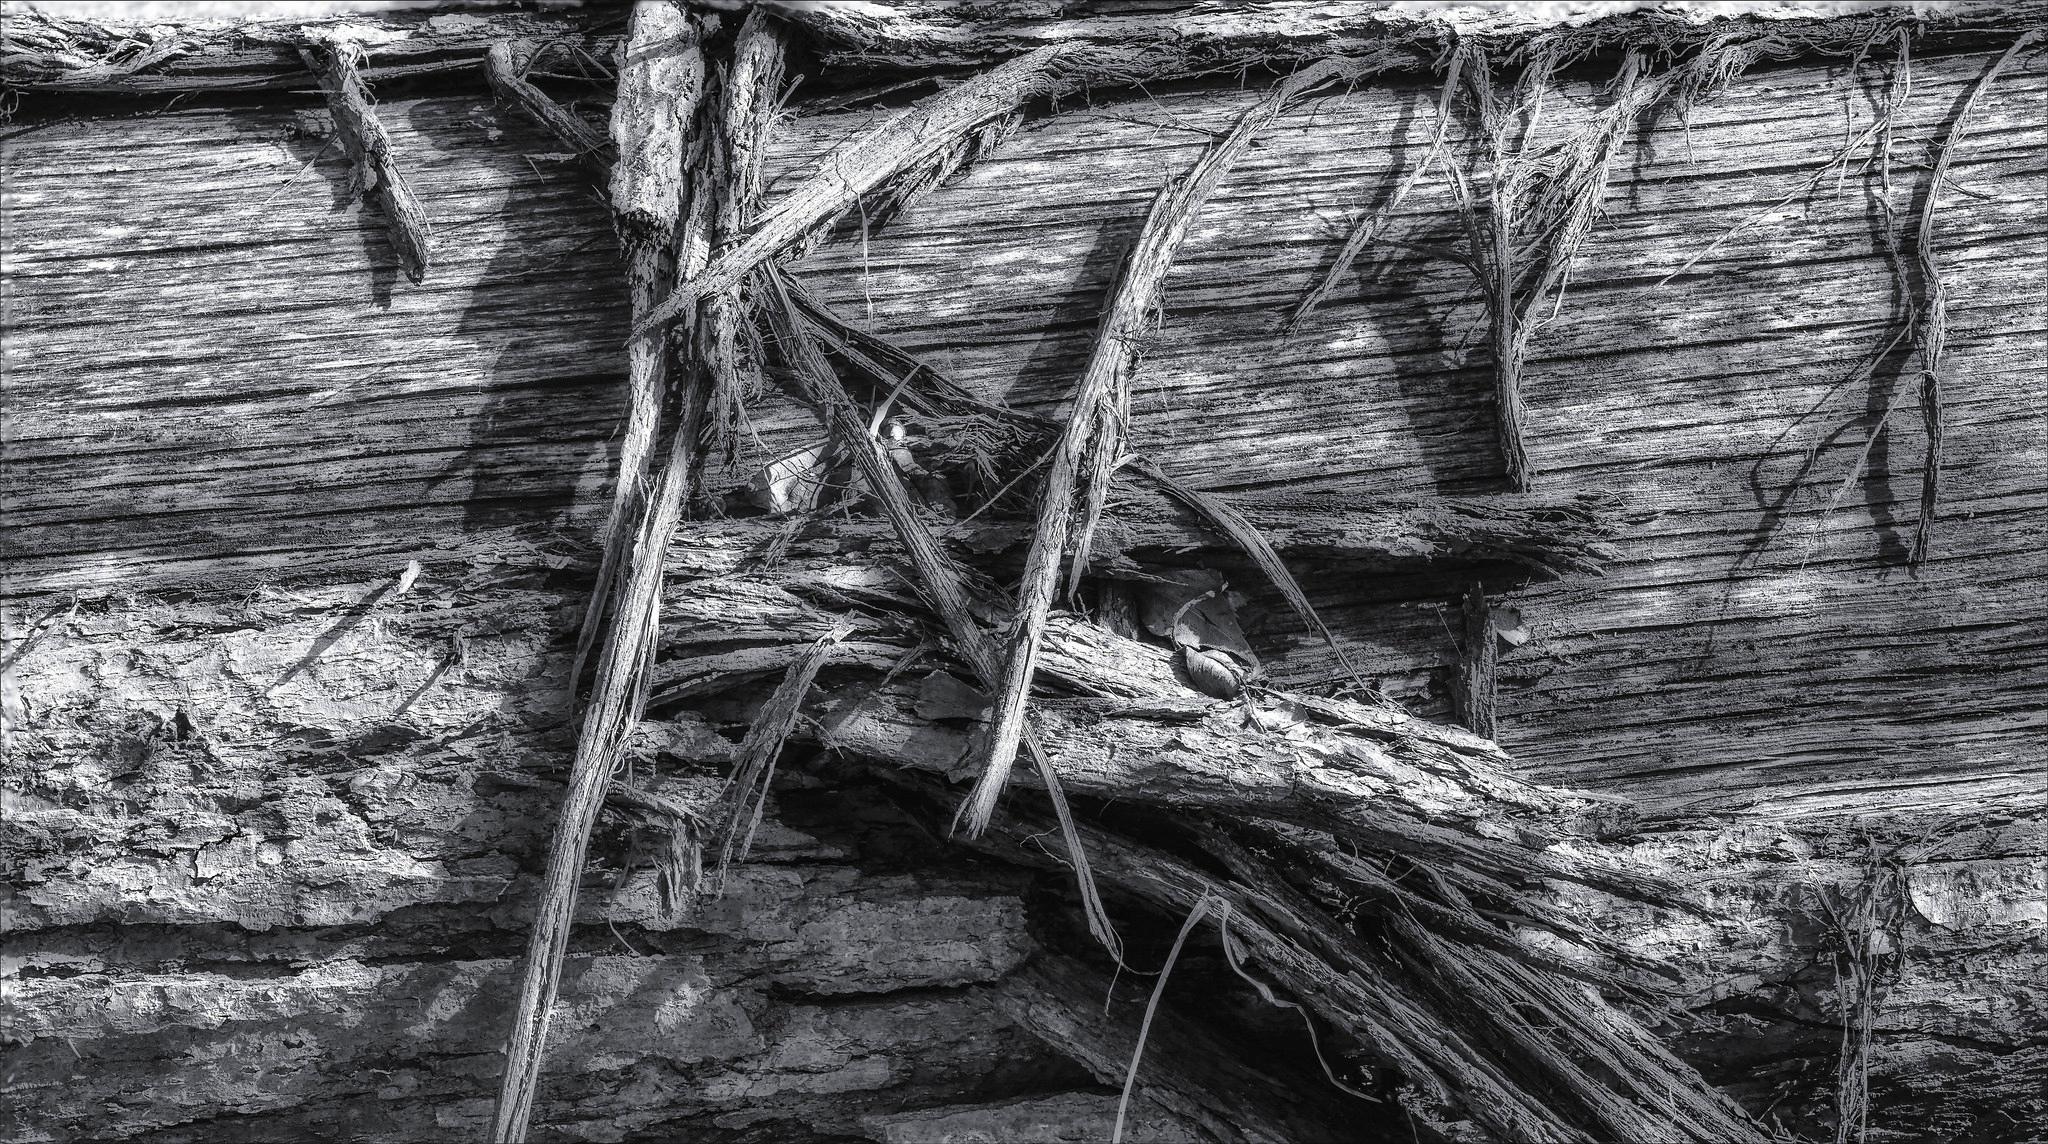 peeling bark decaying log  - monochrome - docdenny | ello